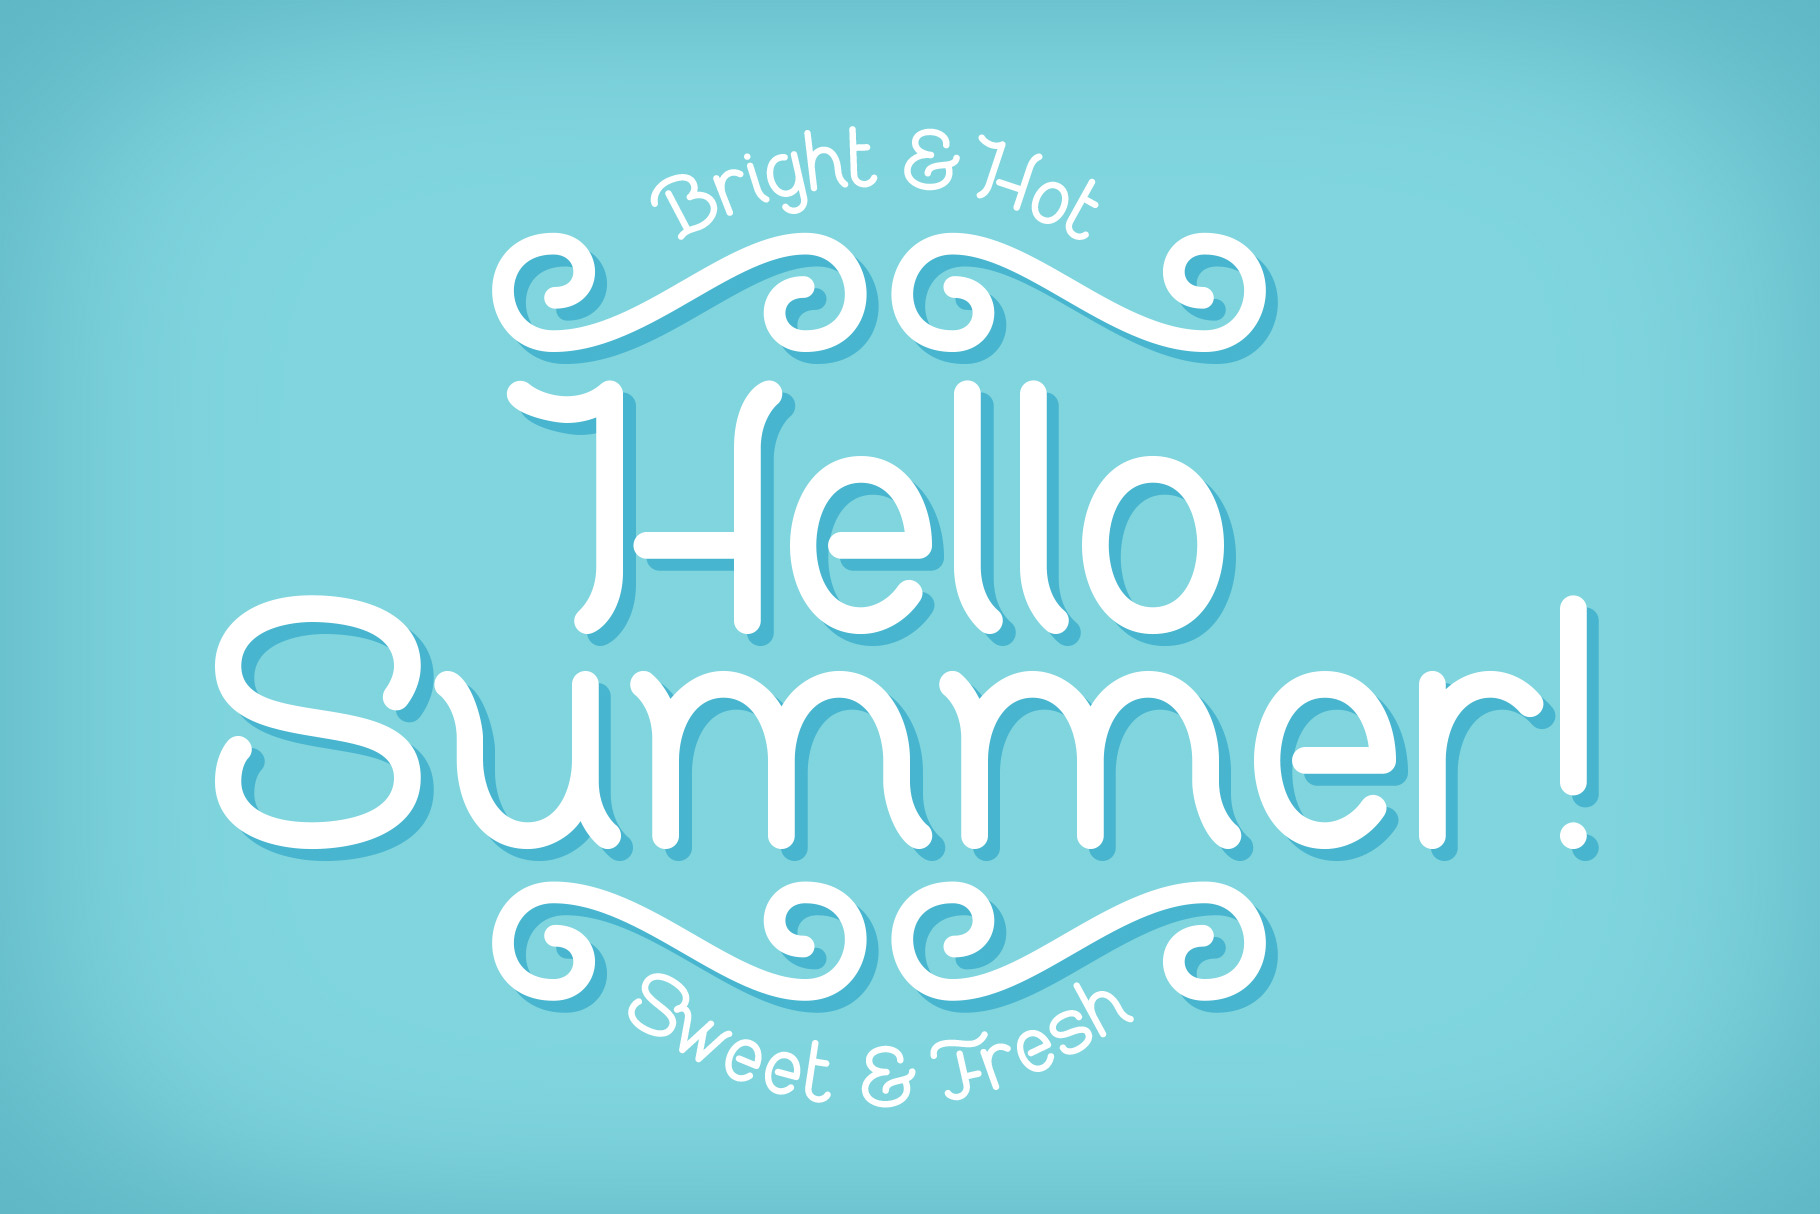 Sweet & Fresh font with Mockup example image 2